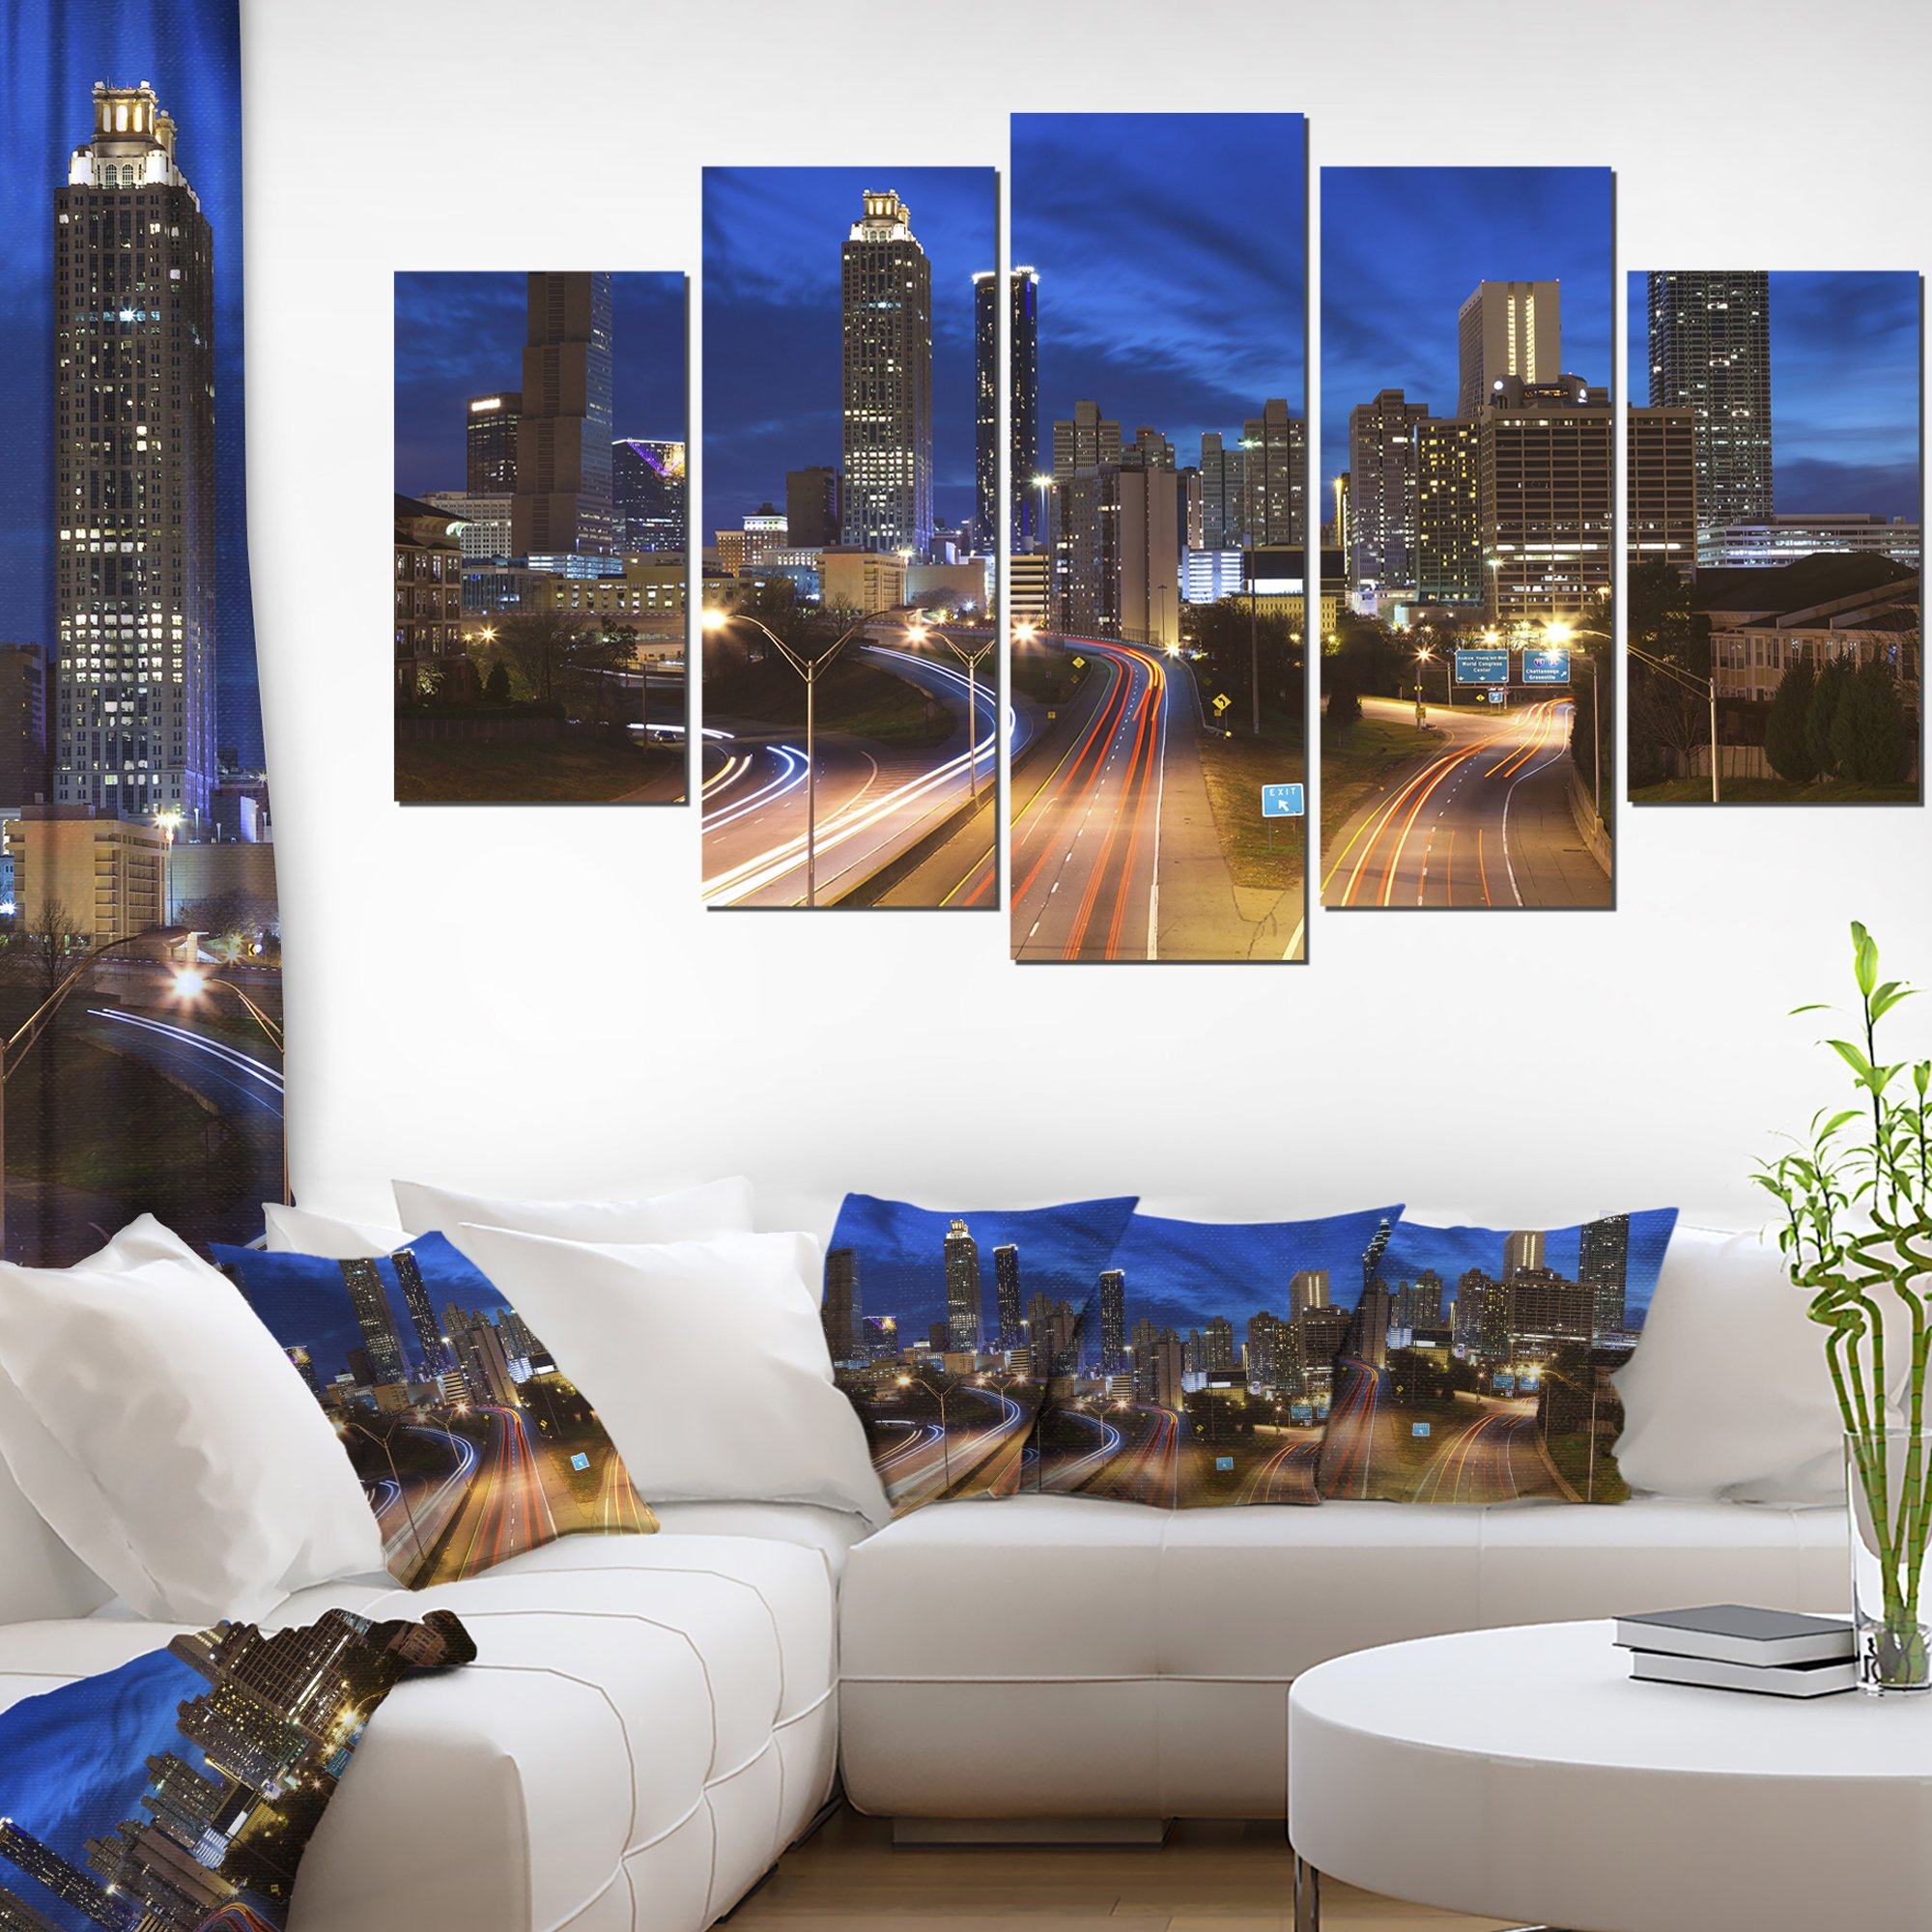 Design Art Atlanta Skyline Twilight Blue Hour-Cityscape Canvas print-60x32 5 Piece-PT9877-373, 60X32-5 Panels Diamond Shape